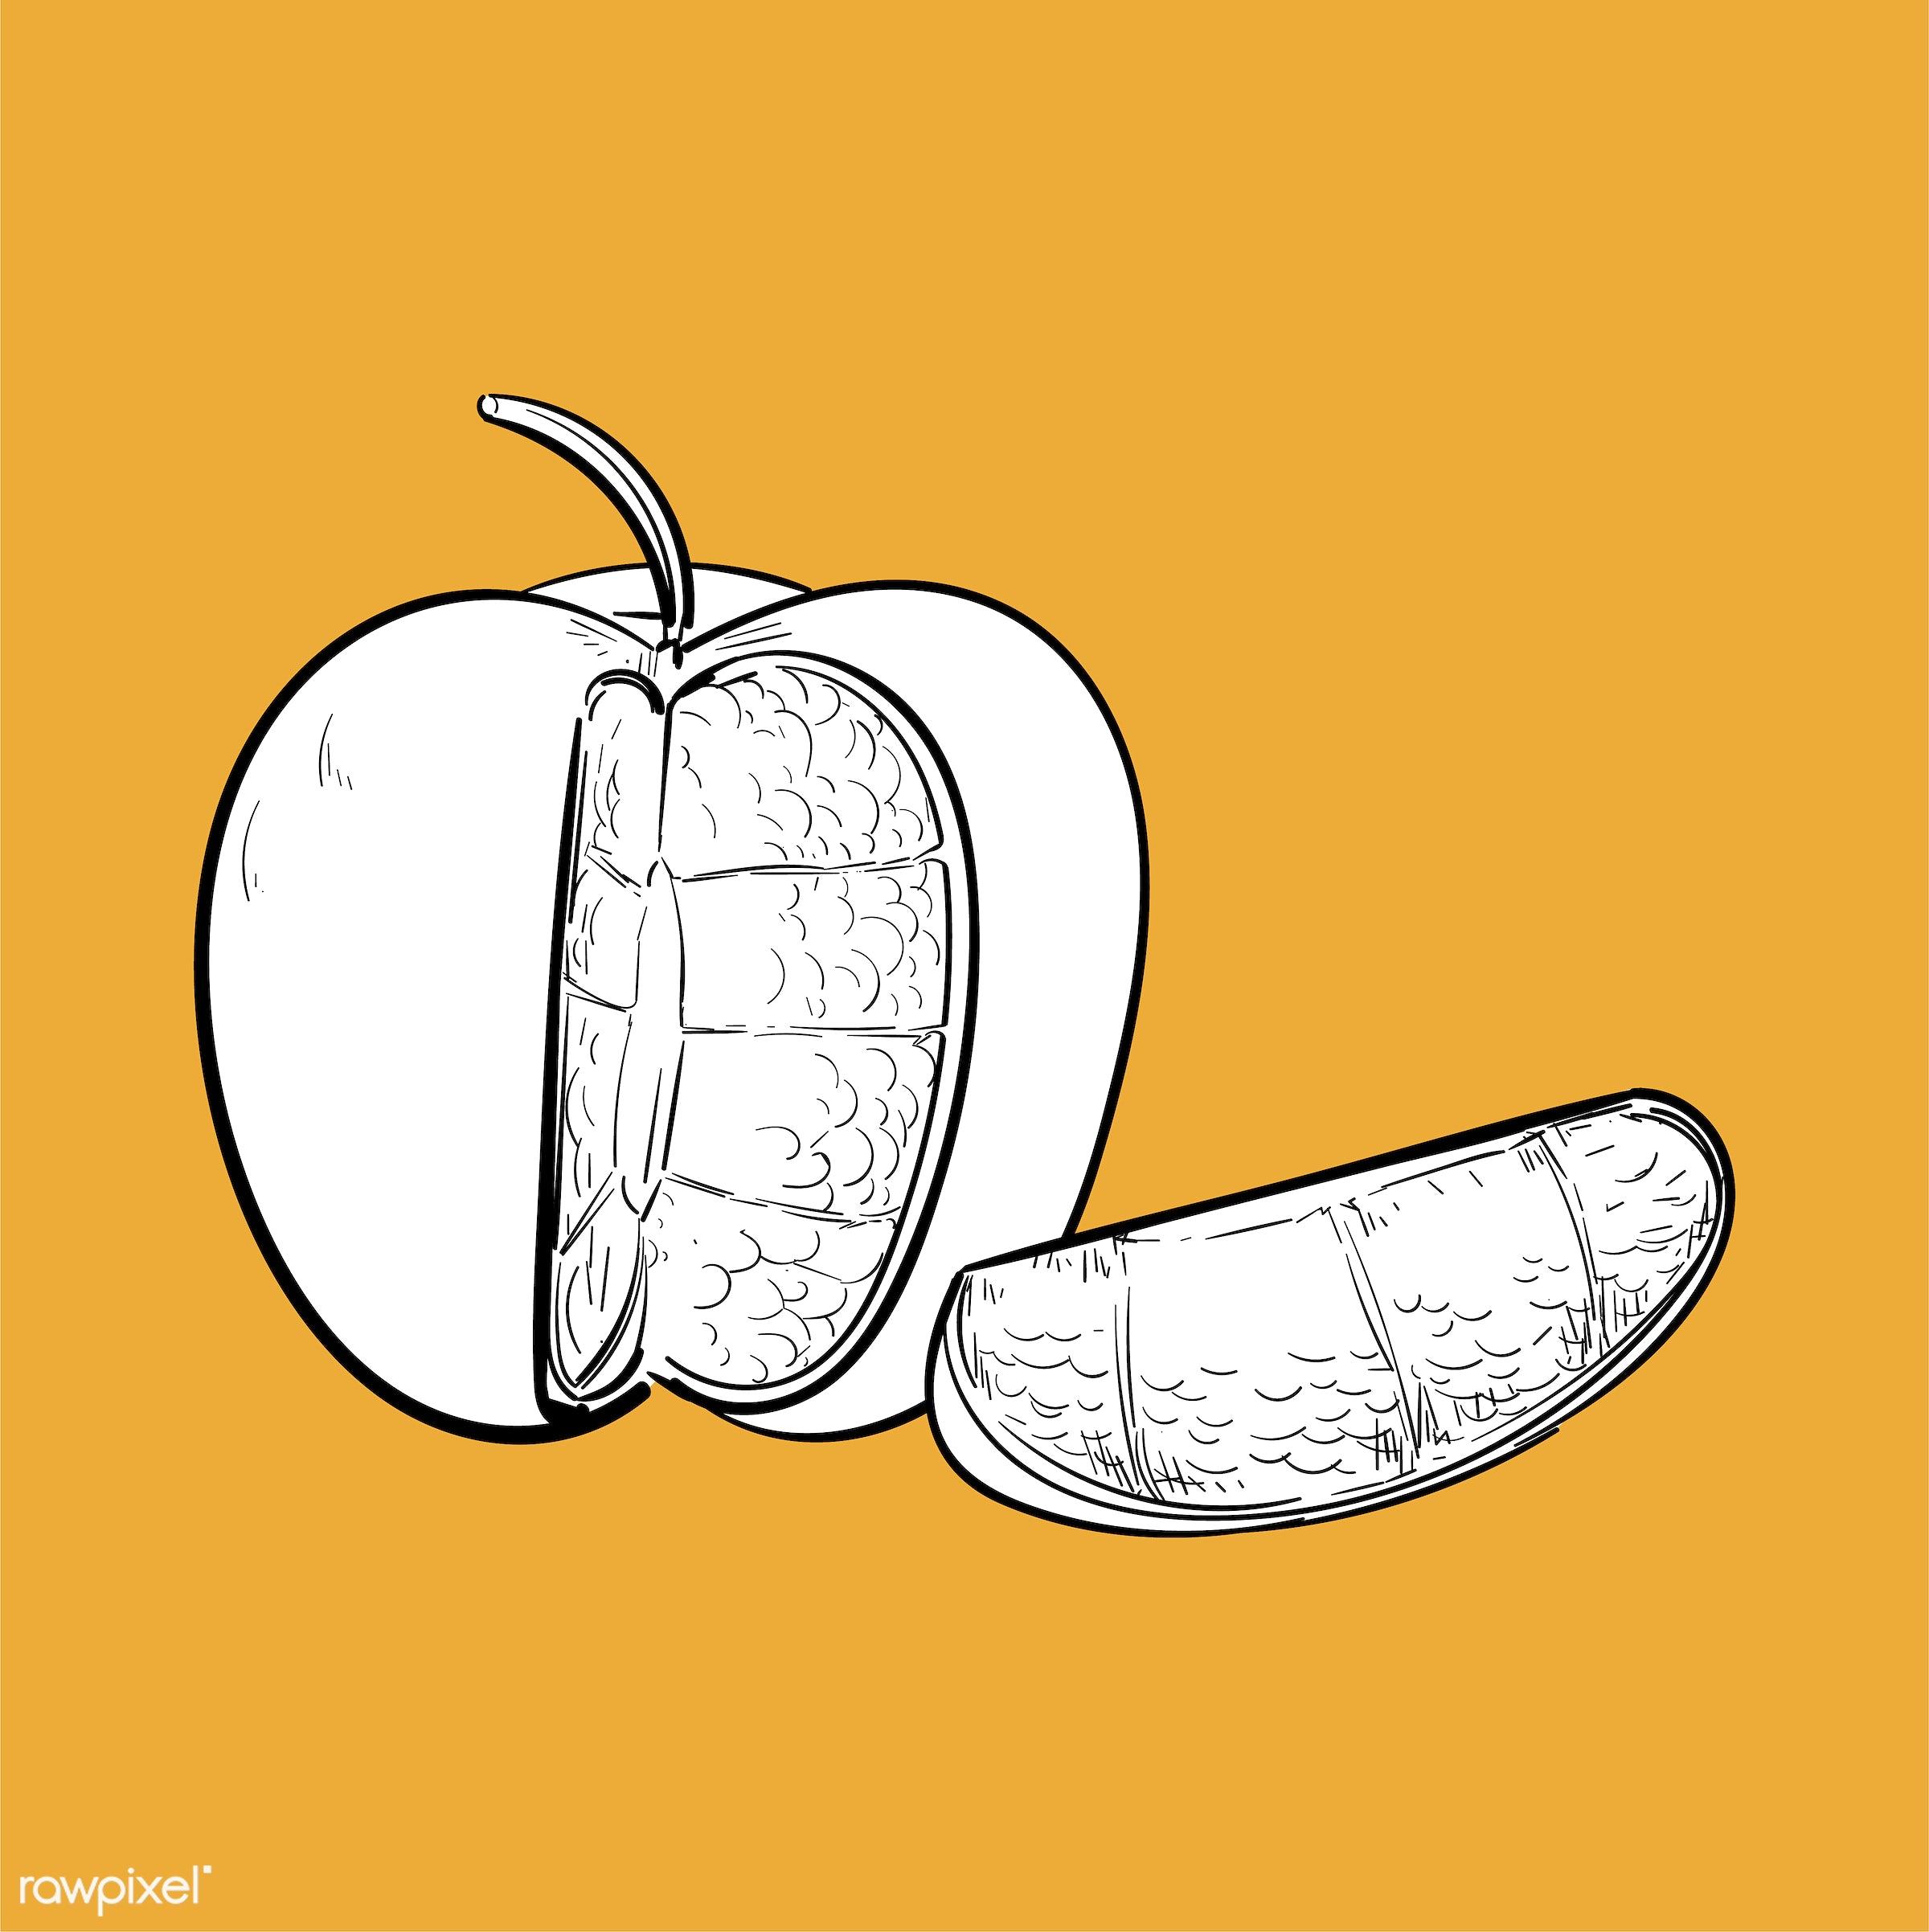 Hand drawing illustration of individuality concept - apple, art, artwork, contrast, creative, creativity, cut, design,...